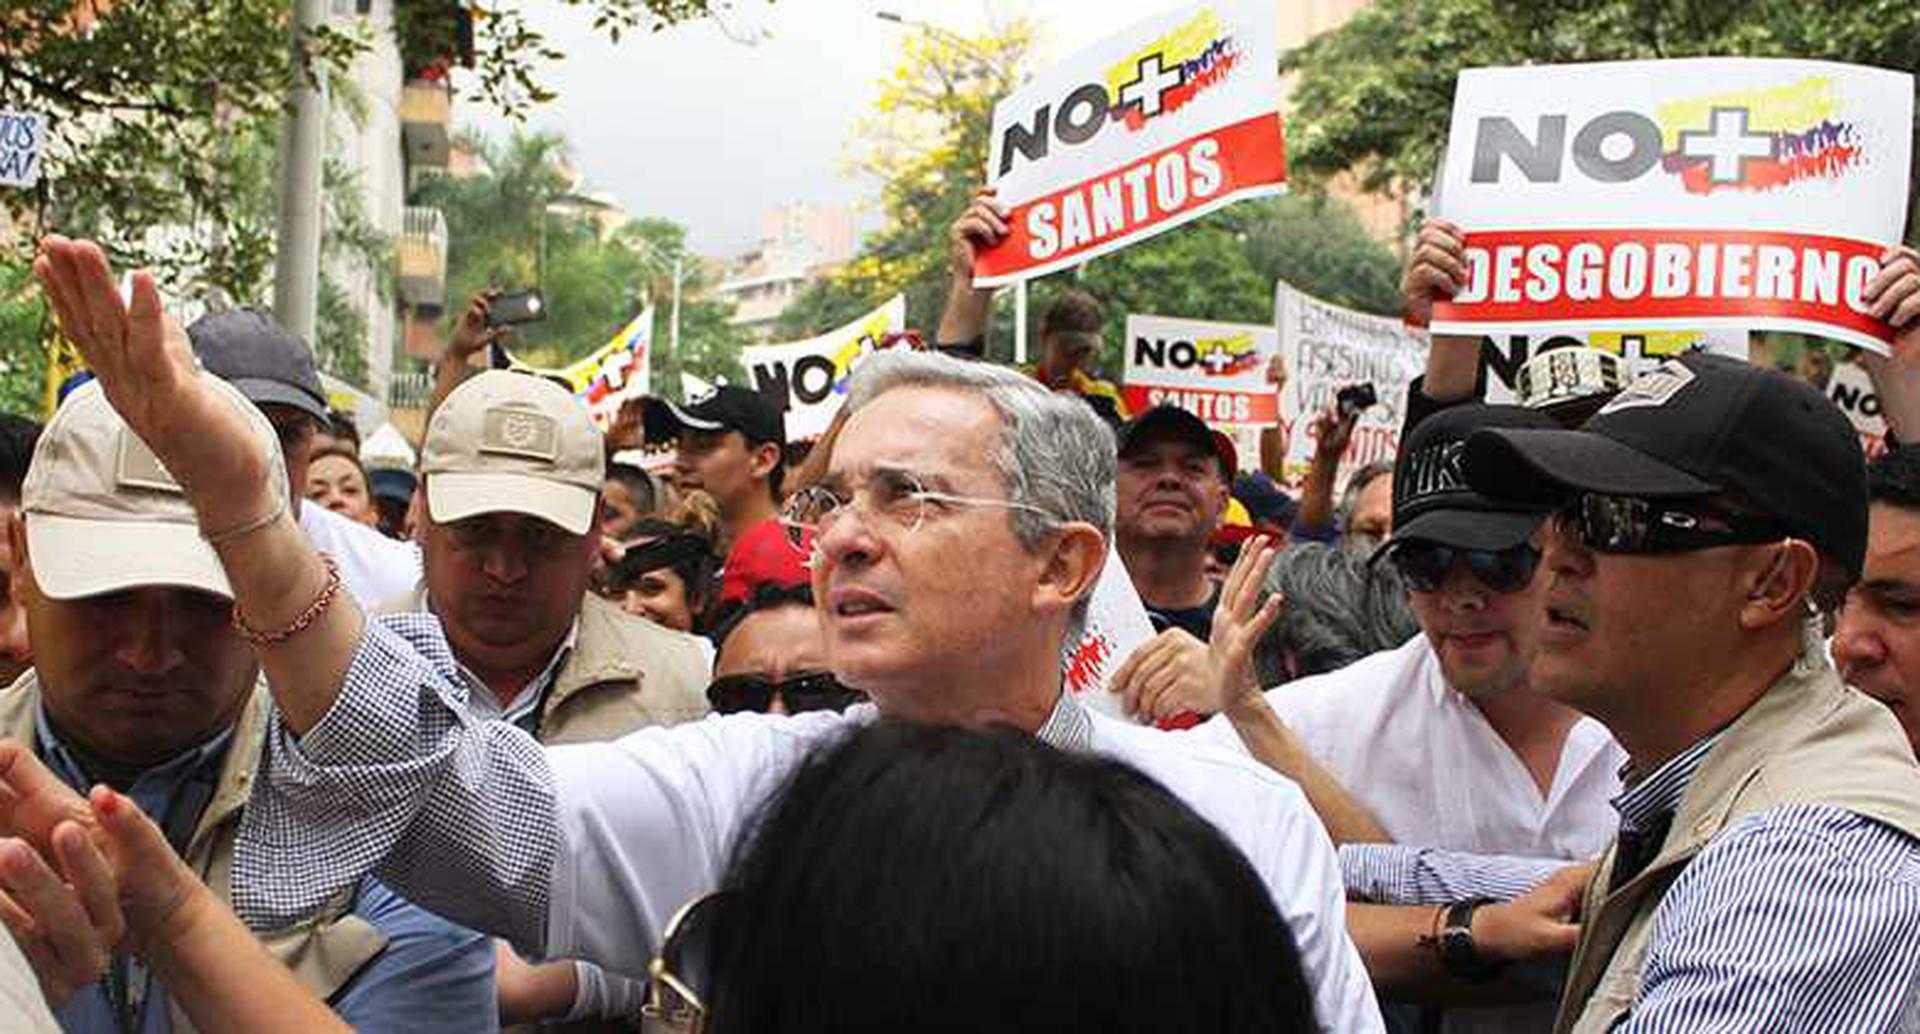 Medellín. Foto: Pablo Andrés Monsalve / SEMANA